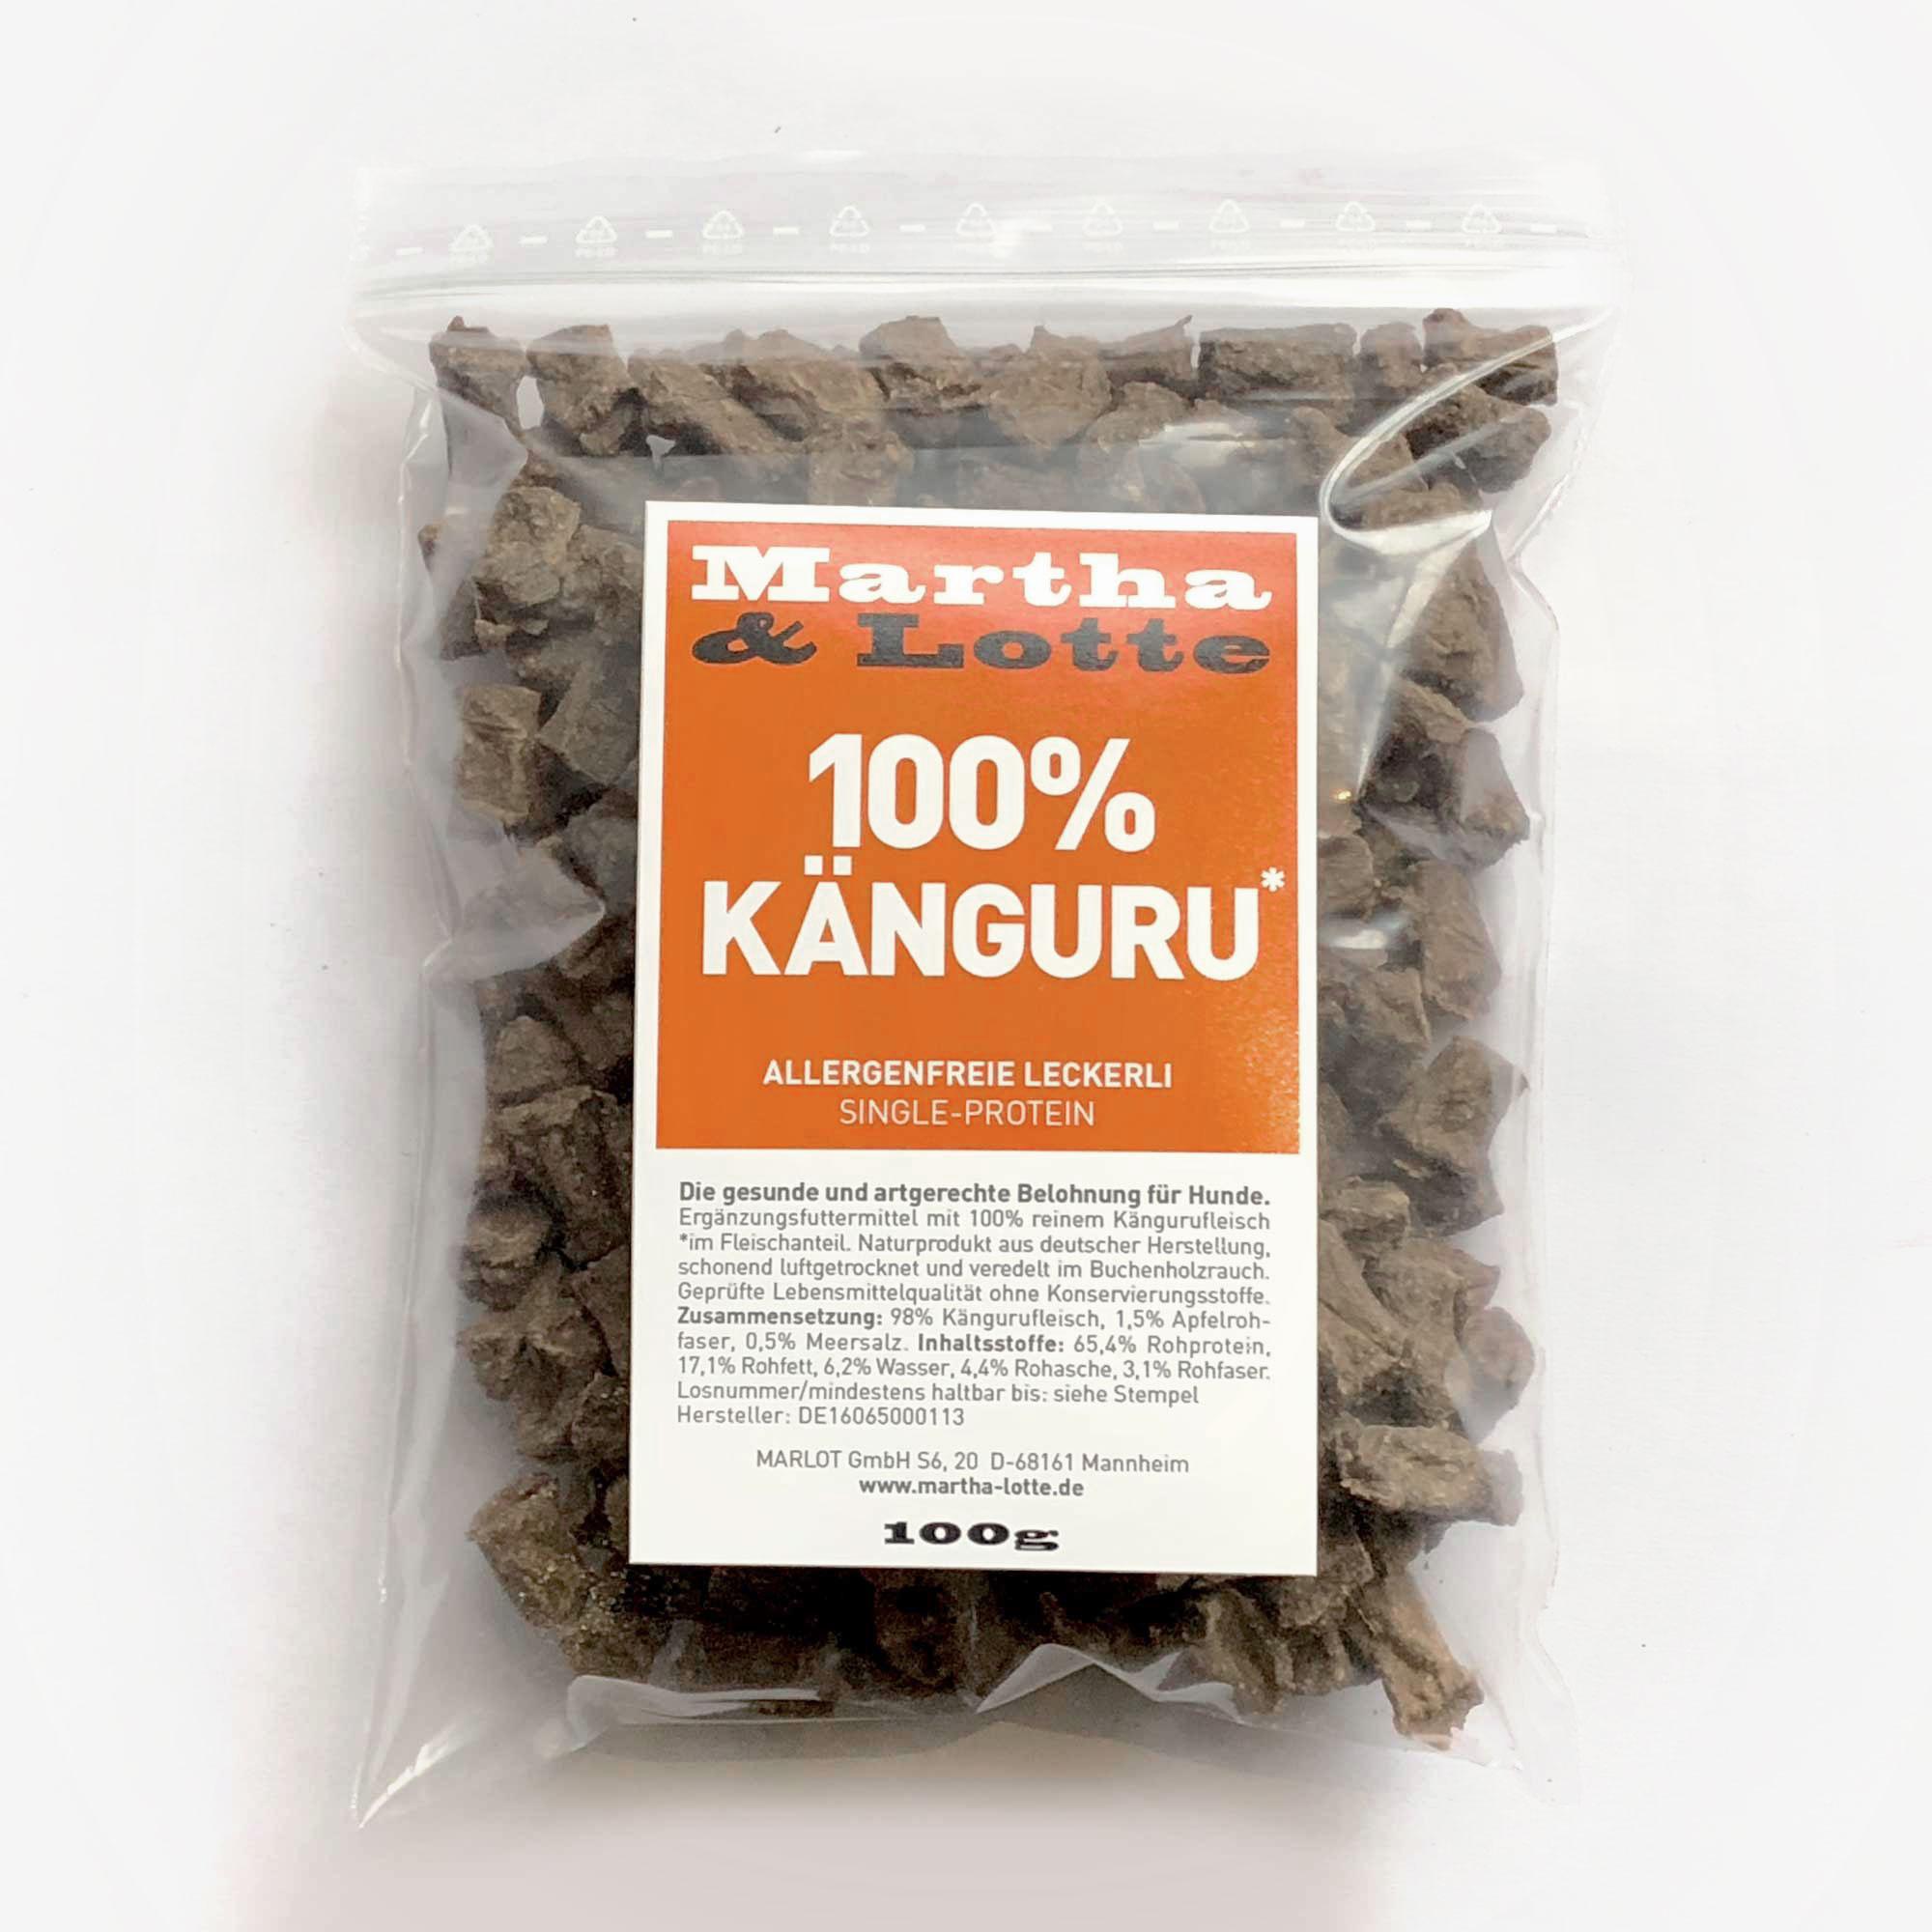 Marthalotte Hundeleckerli 100prozent Kaenguru